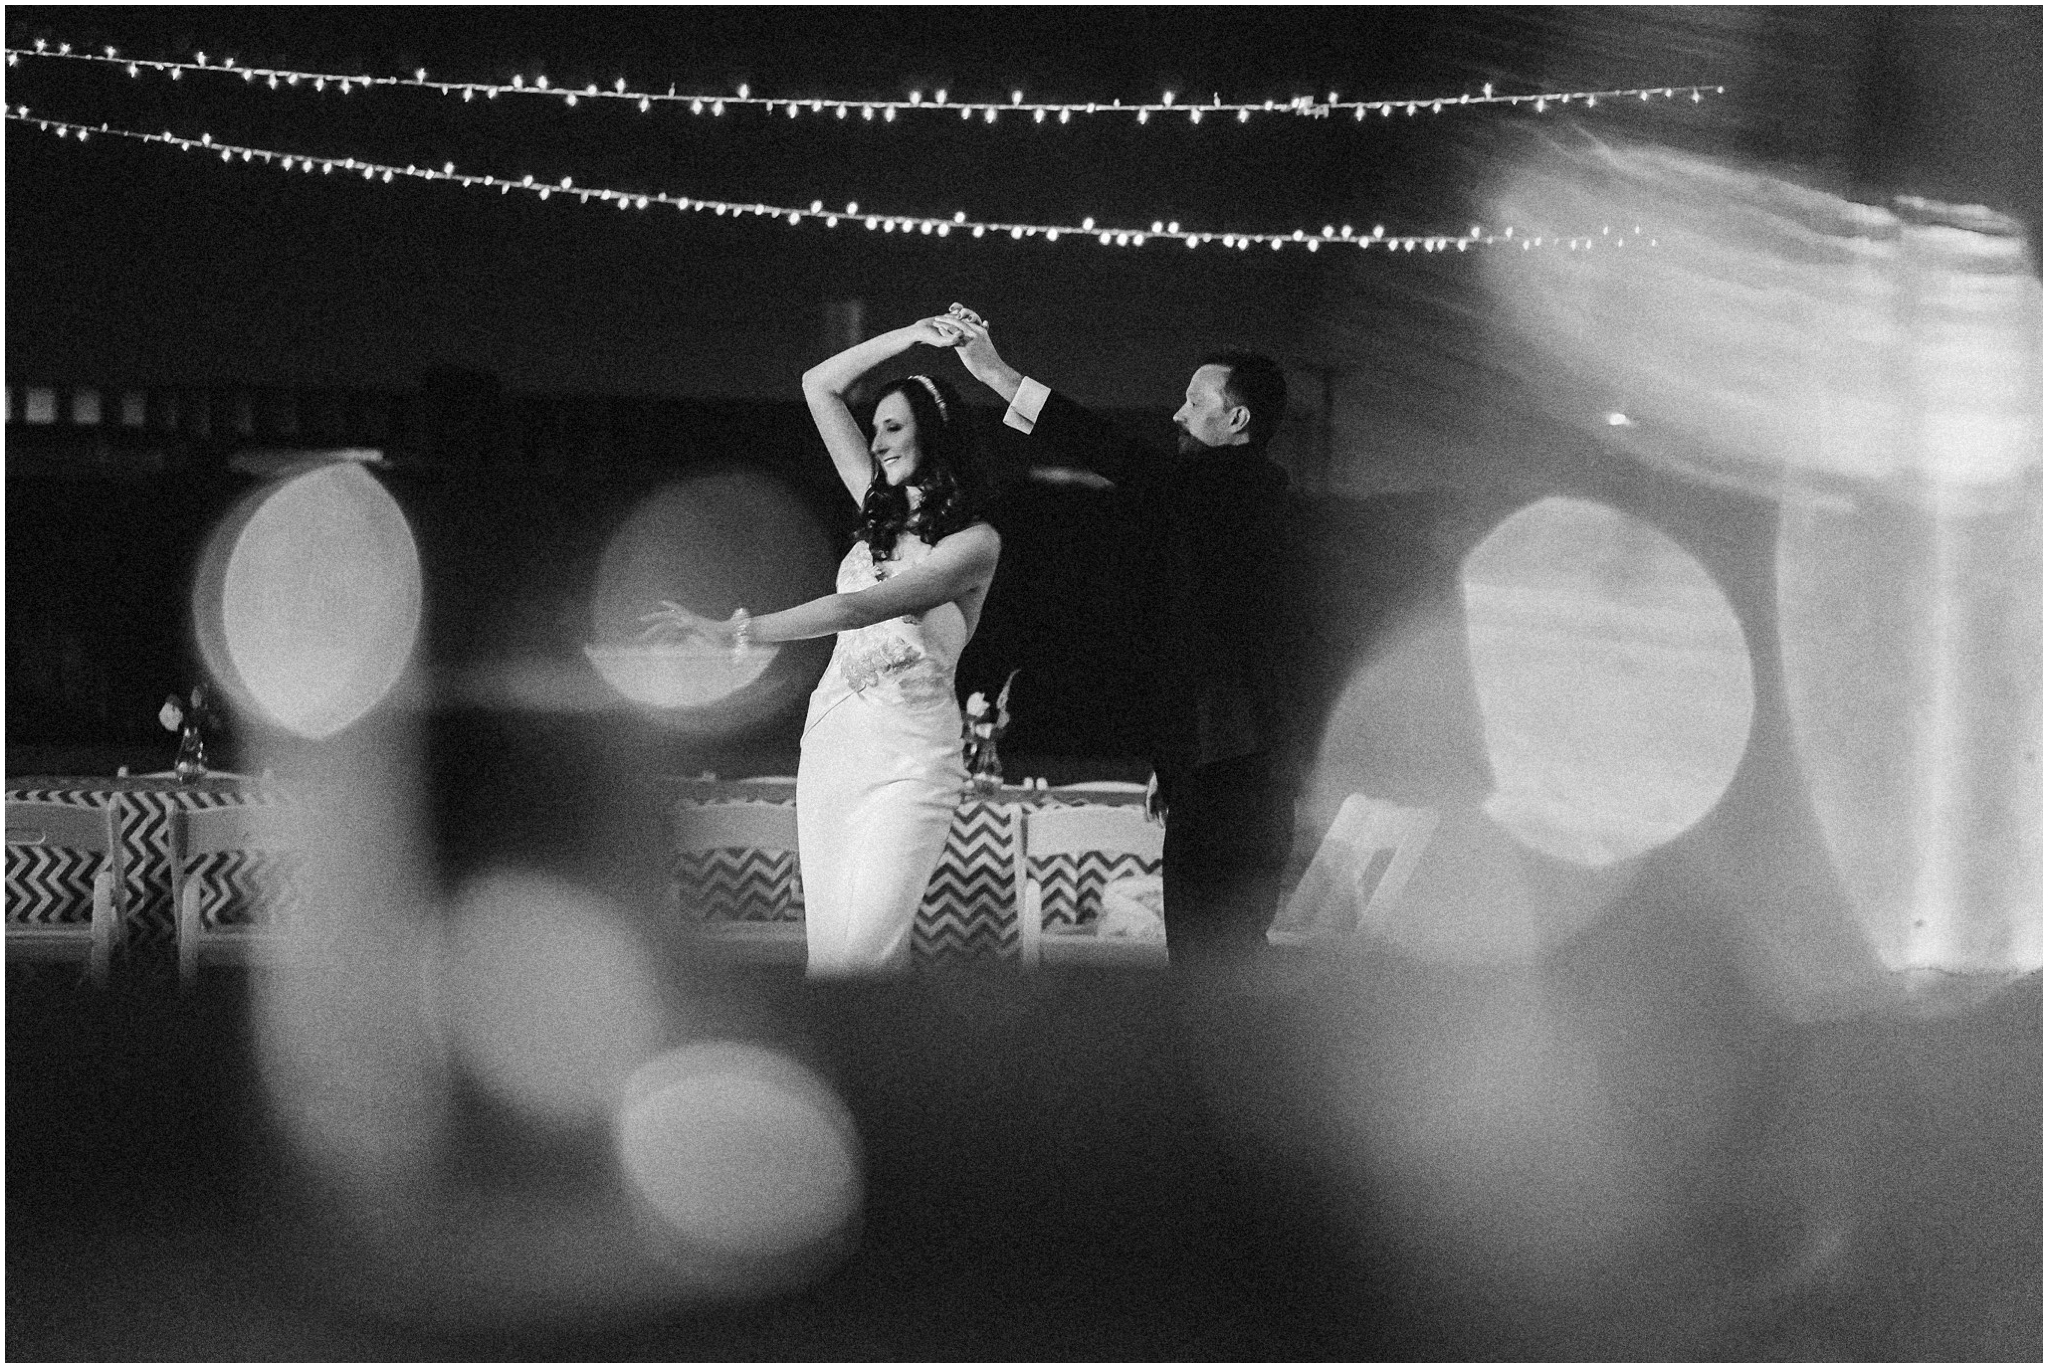 TJ-Romero-Photographer_Handcrafted-nostalgic-romantic-38.jpg